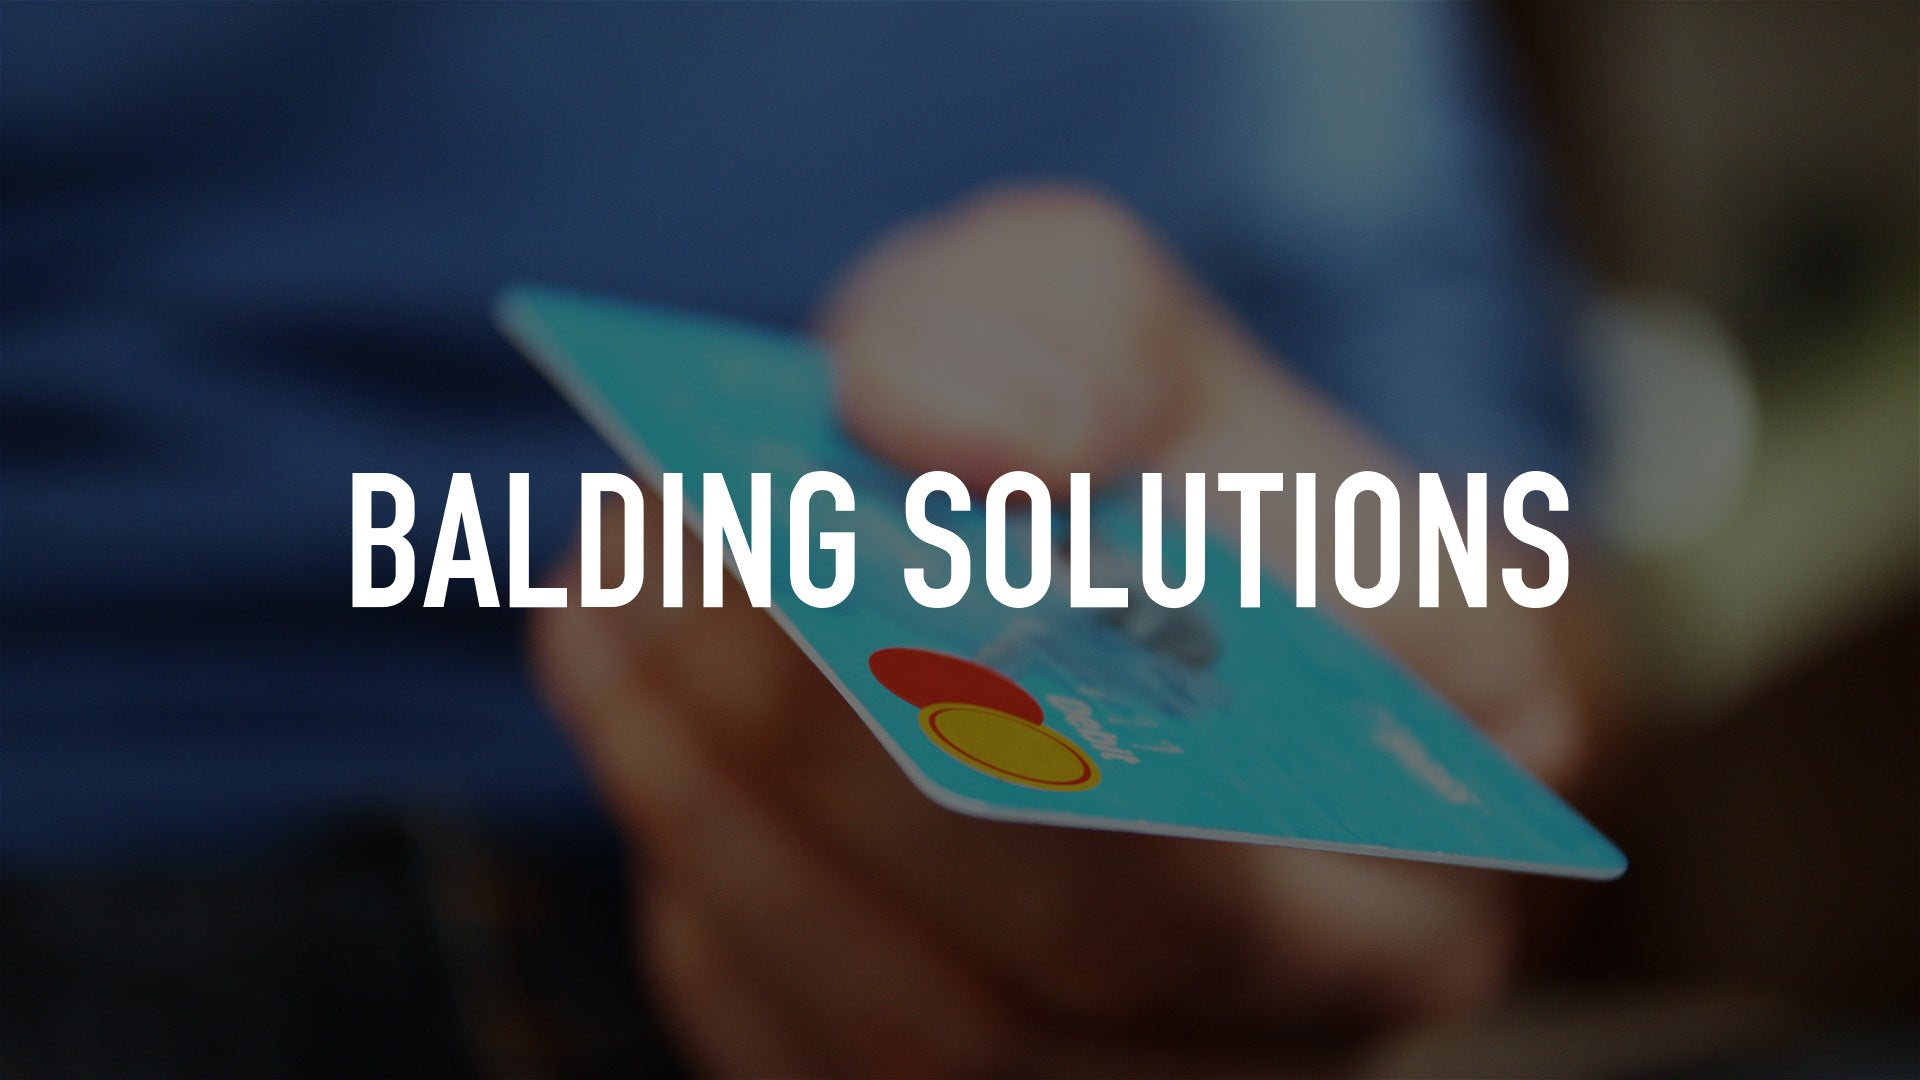 Balding Solutions